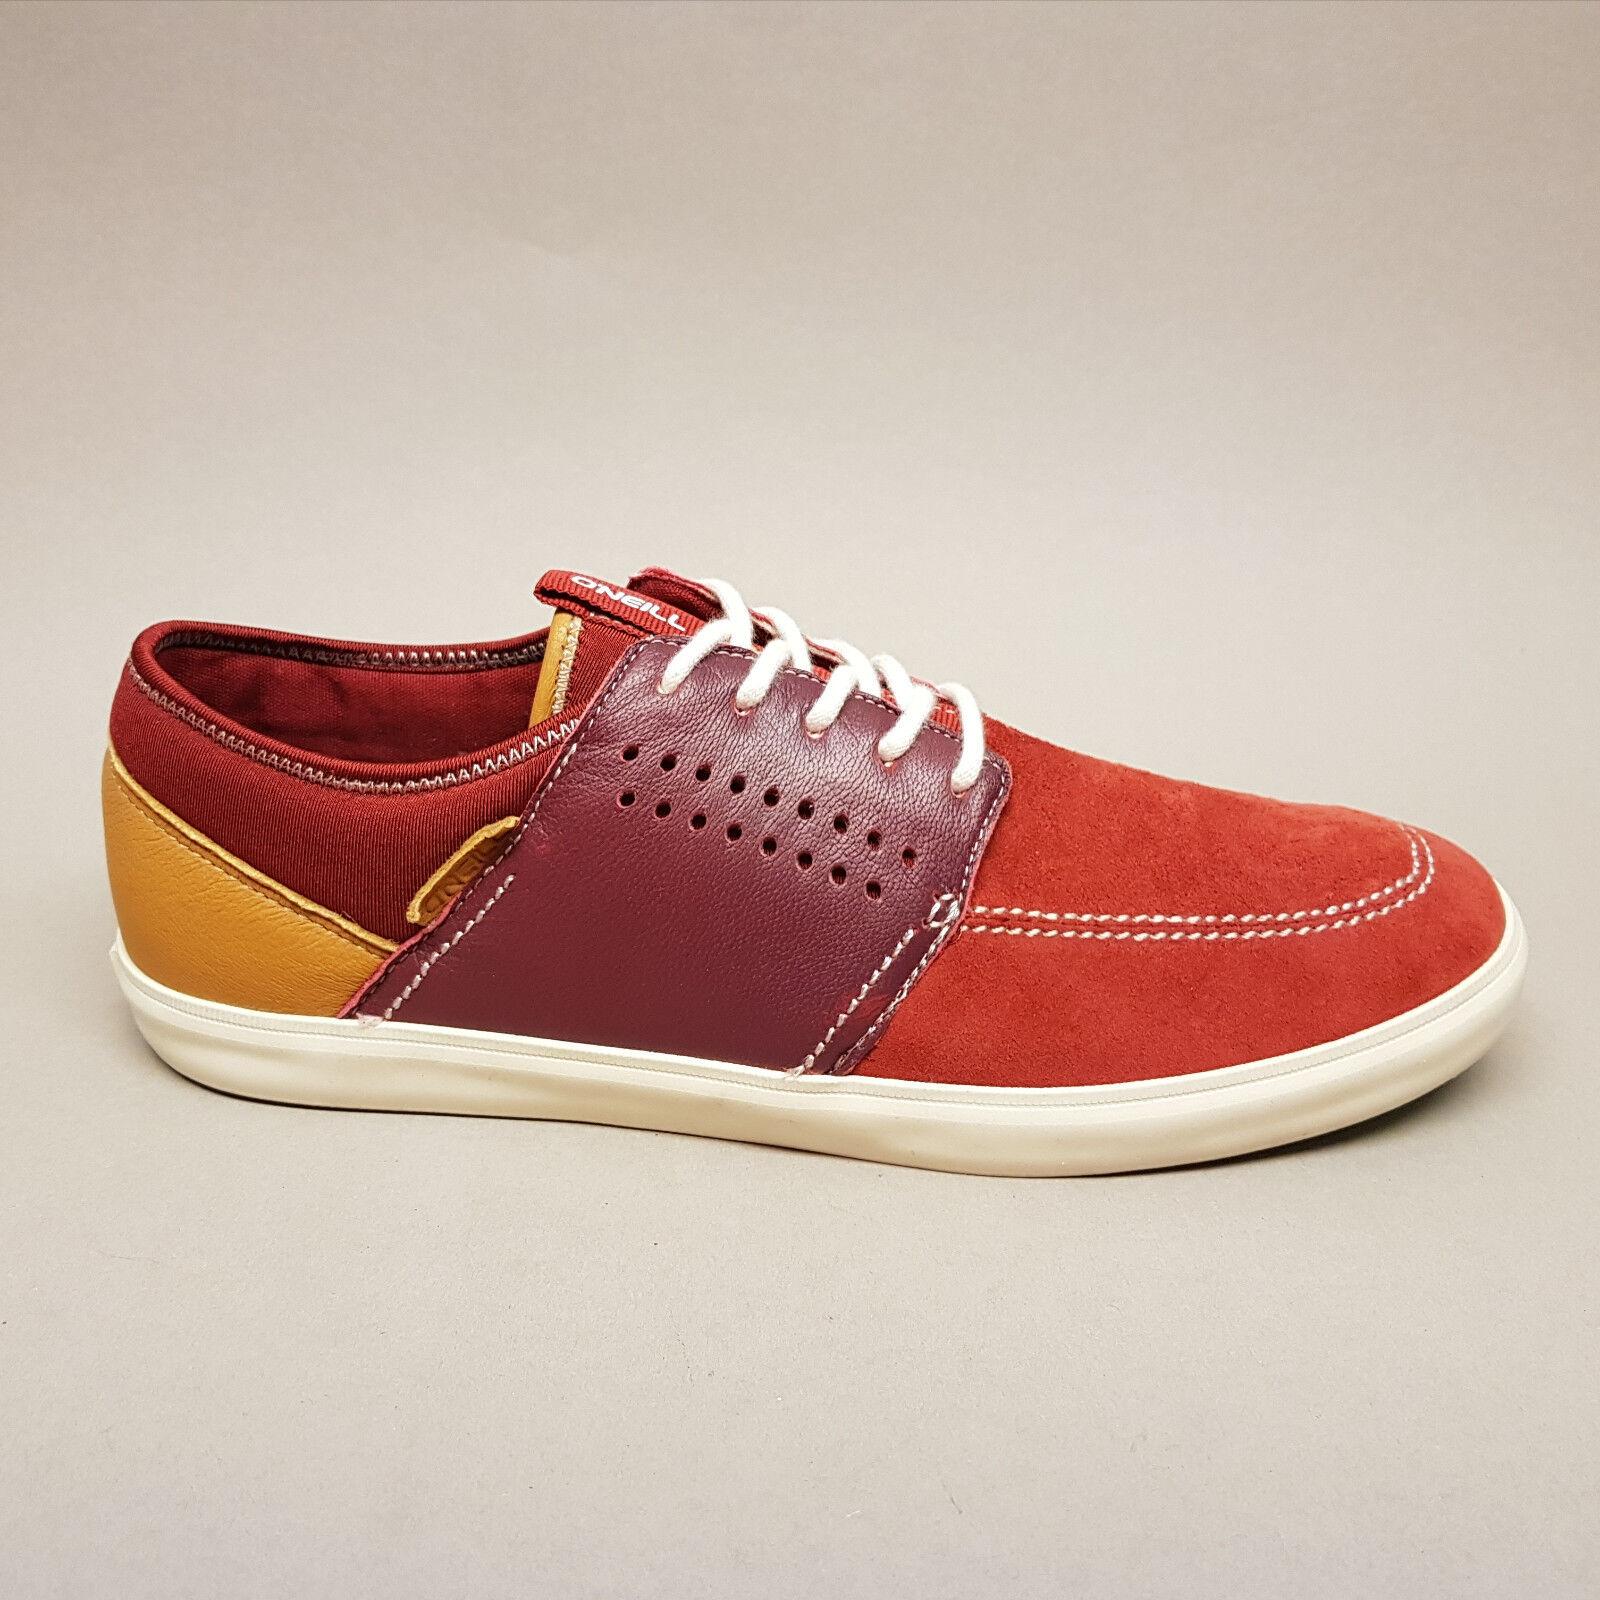 O'Neill Mutant Sneaker Burgundy Suede 59.1098.01 F36 Sneaker Mutant Halbschuh rot  40  43  45 16d394